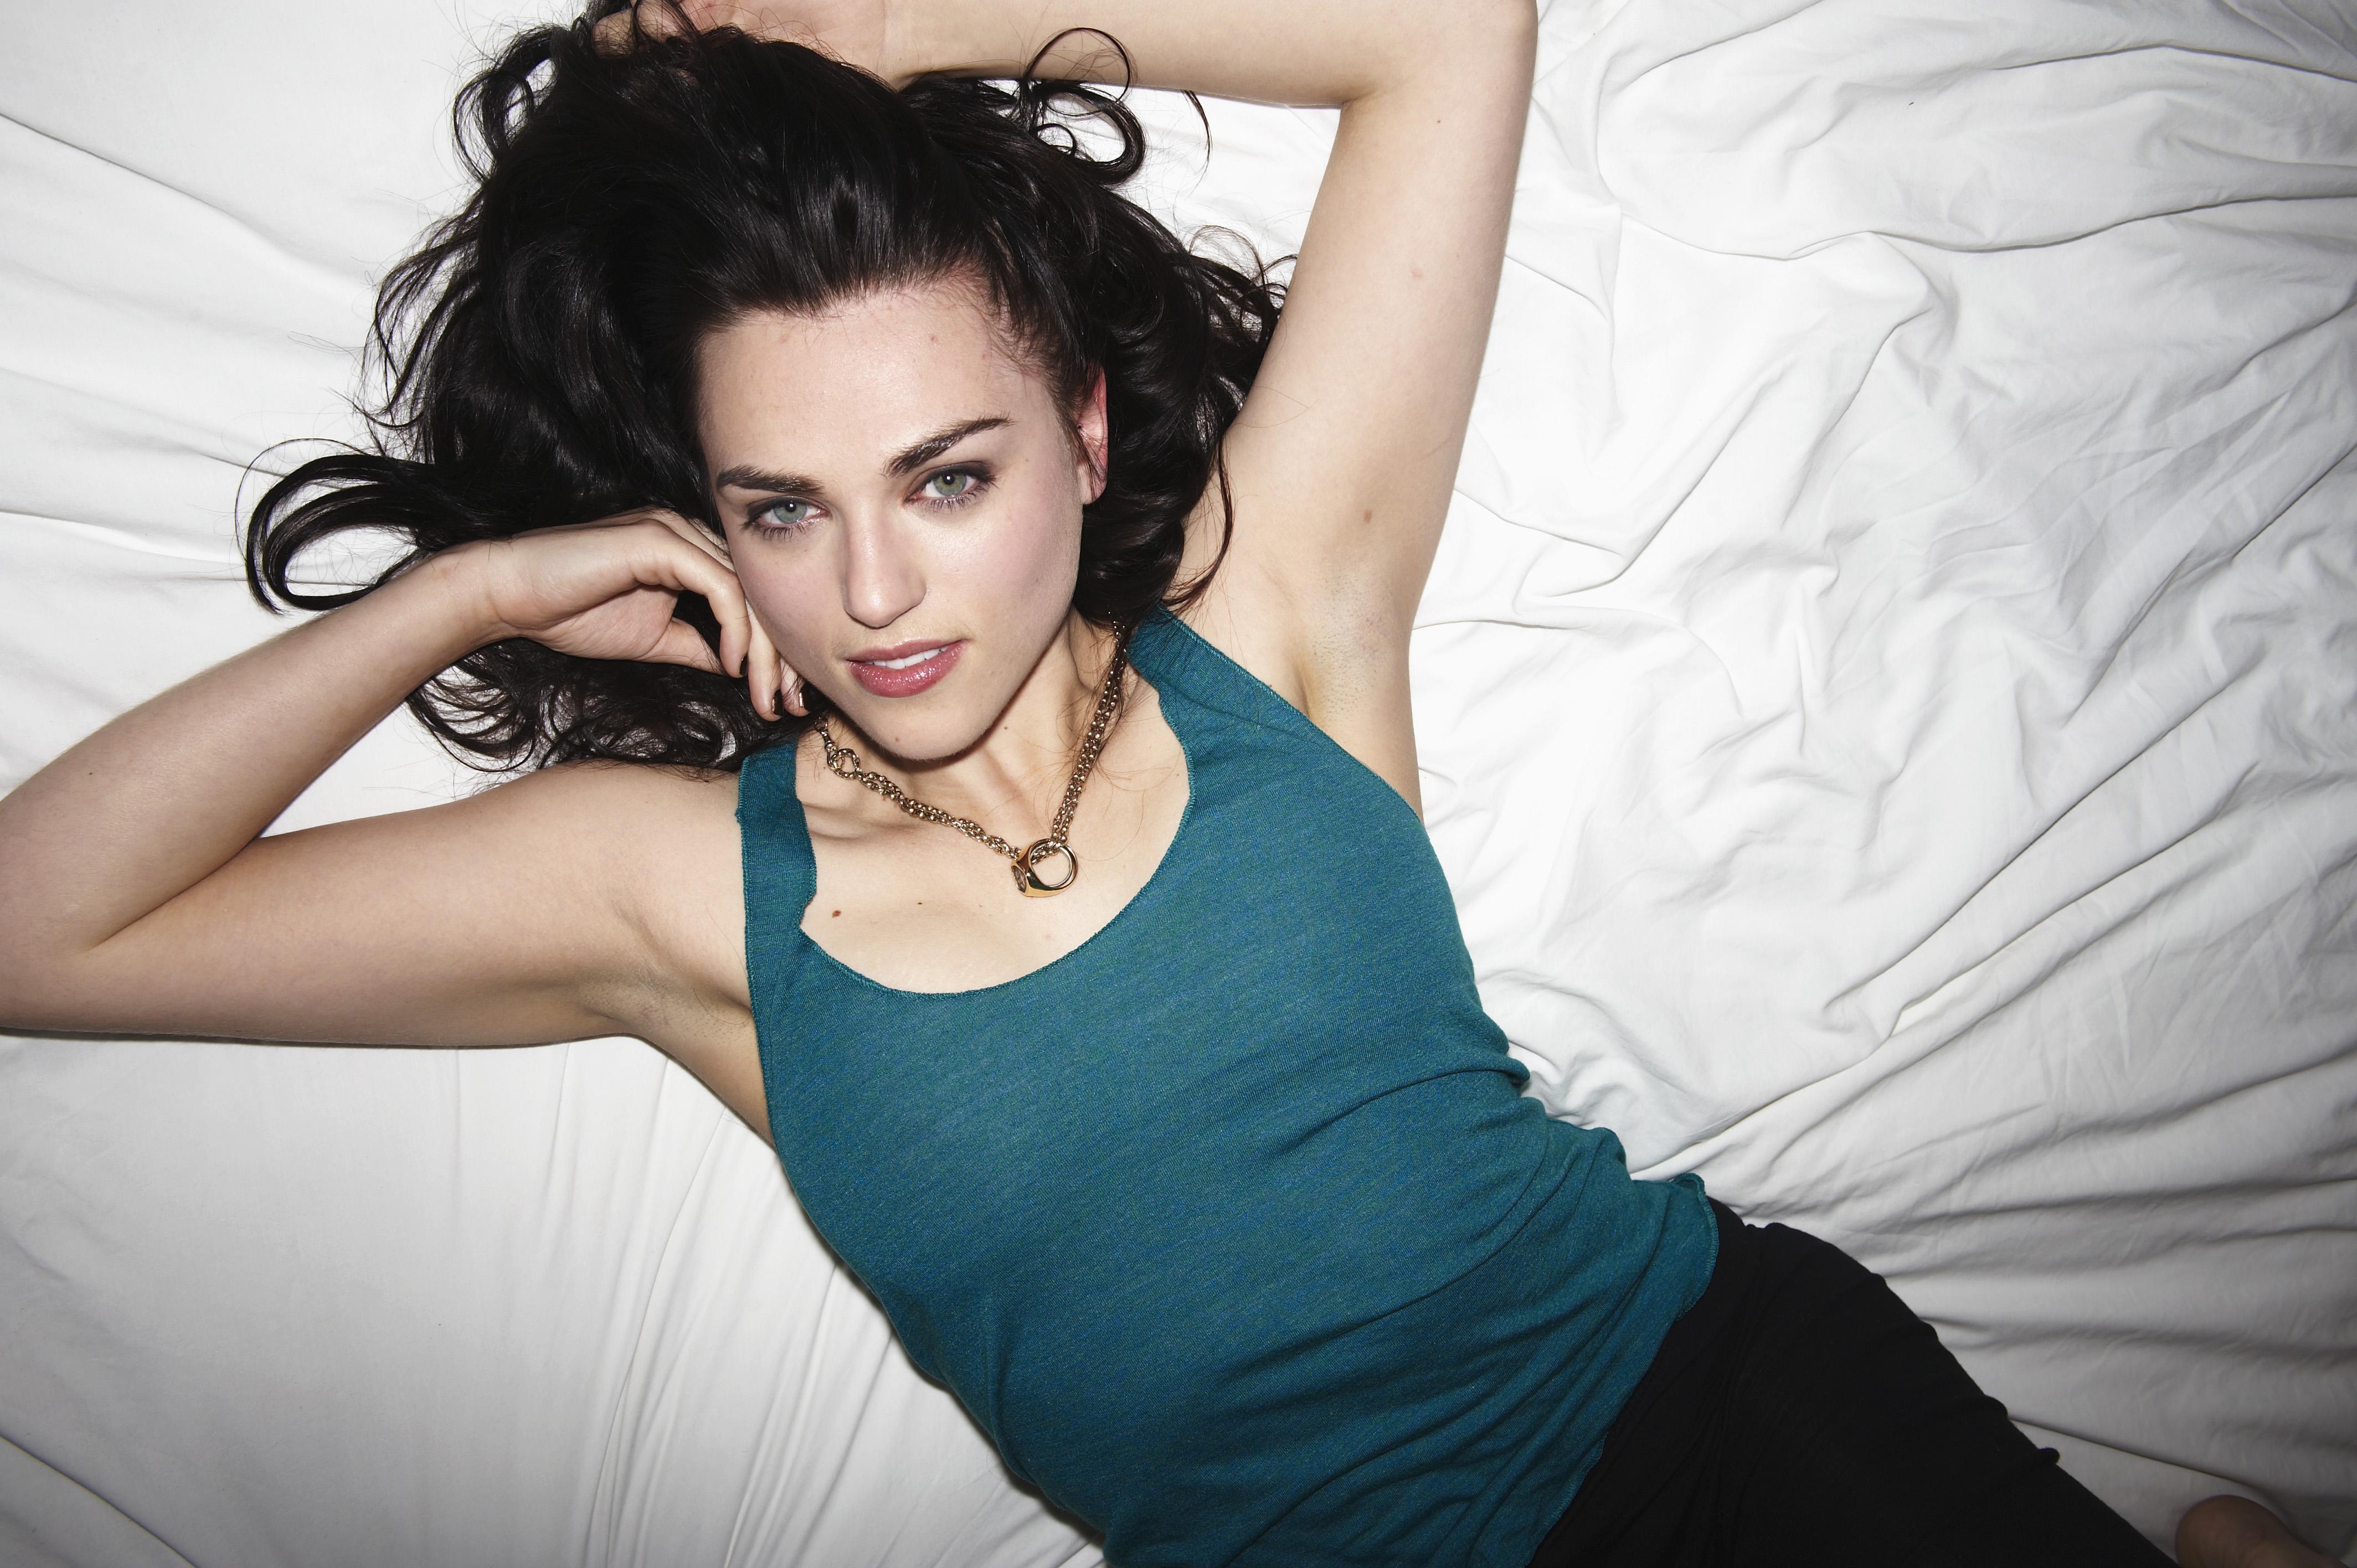 Katie Mcgrath's sexy arm pits